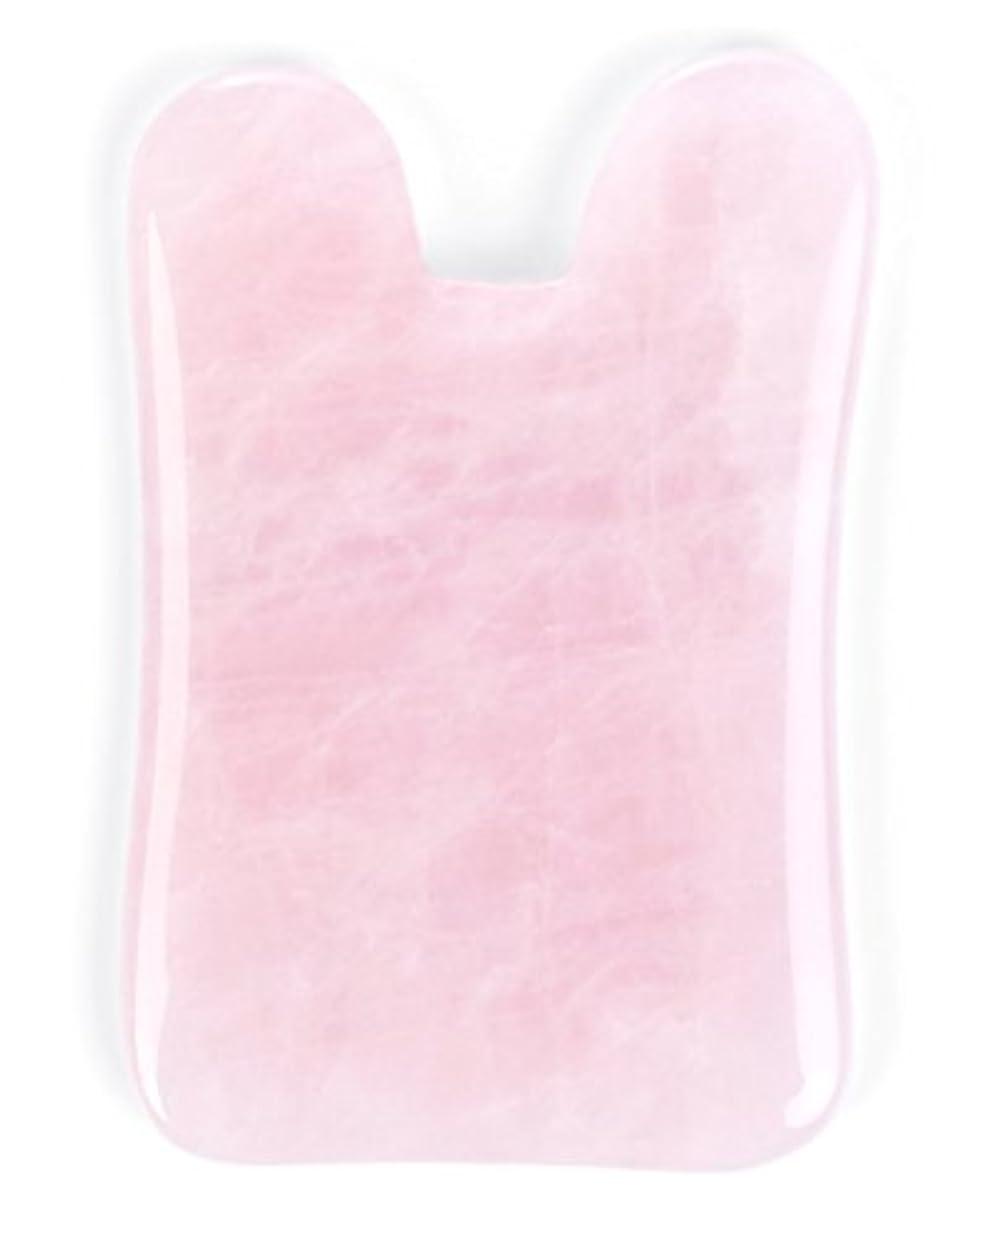 Echo & Kern ピンクローズクォーツかっさプレート マッサージプレートPink Rose Quartz Gua Sha Board-Therapeutic Relief and Skin Renewal -Premium...